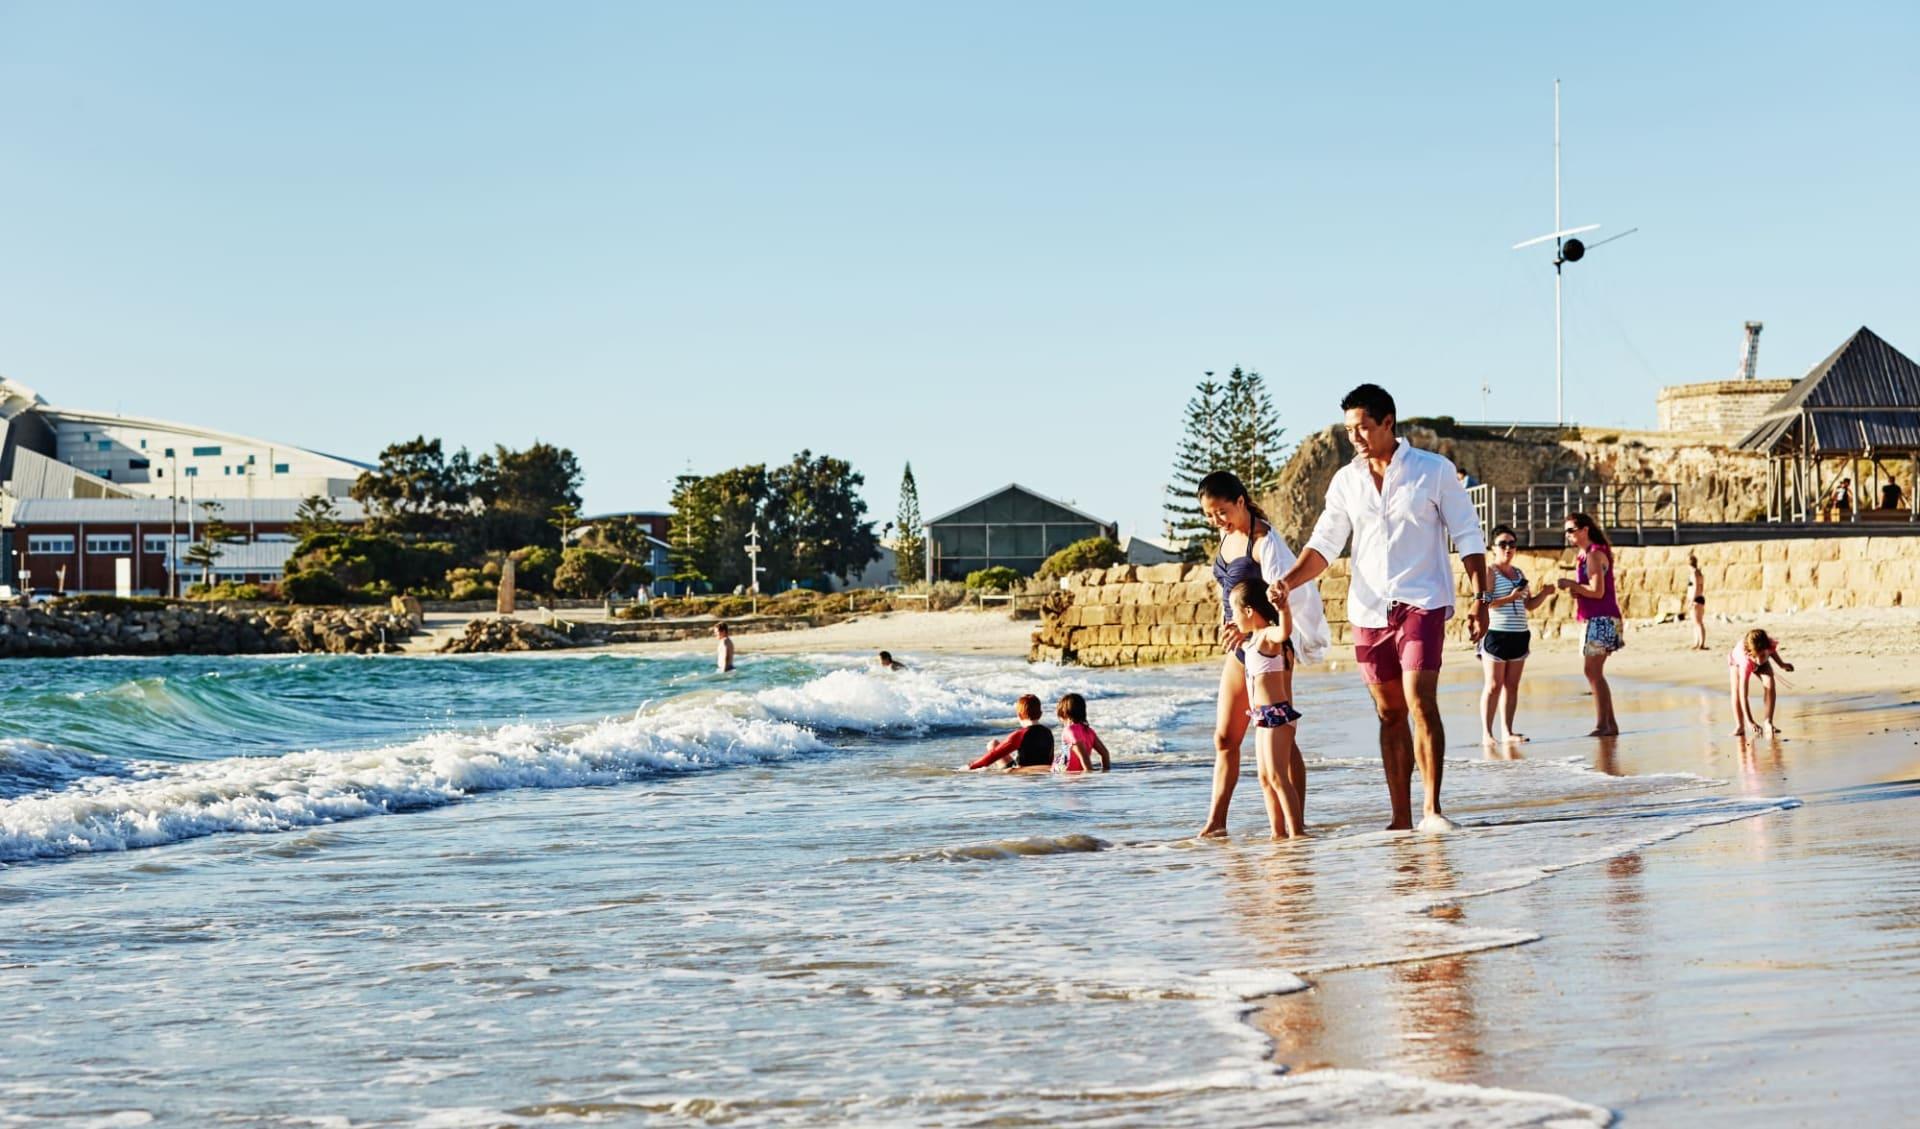 Great Western Explorer - Perth bis Broome: Australia - Western Australia - Perth - Fremantle Beach